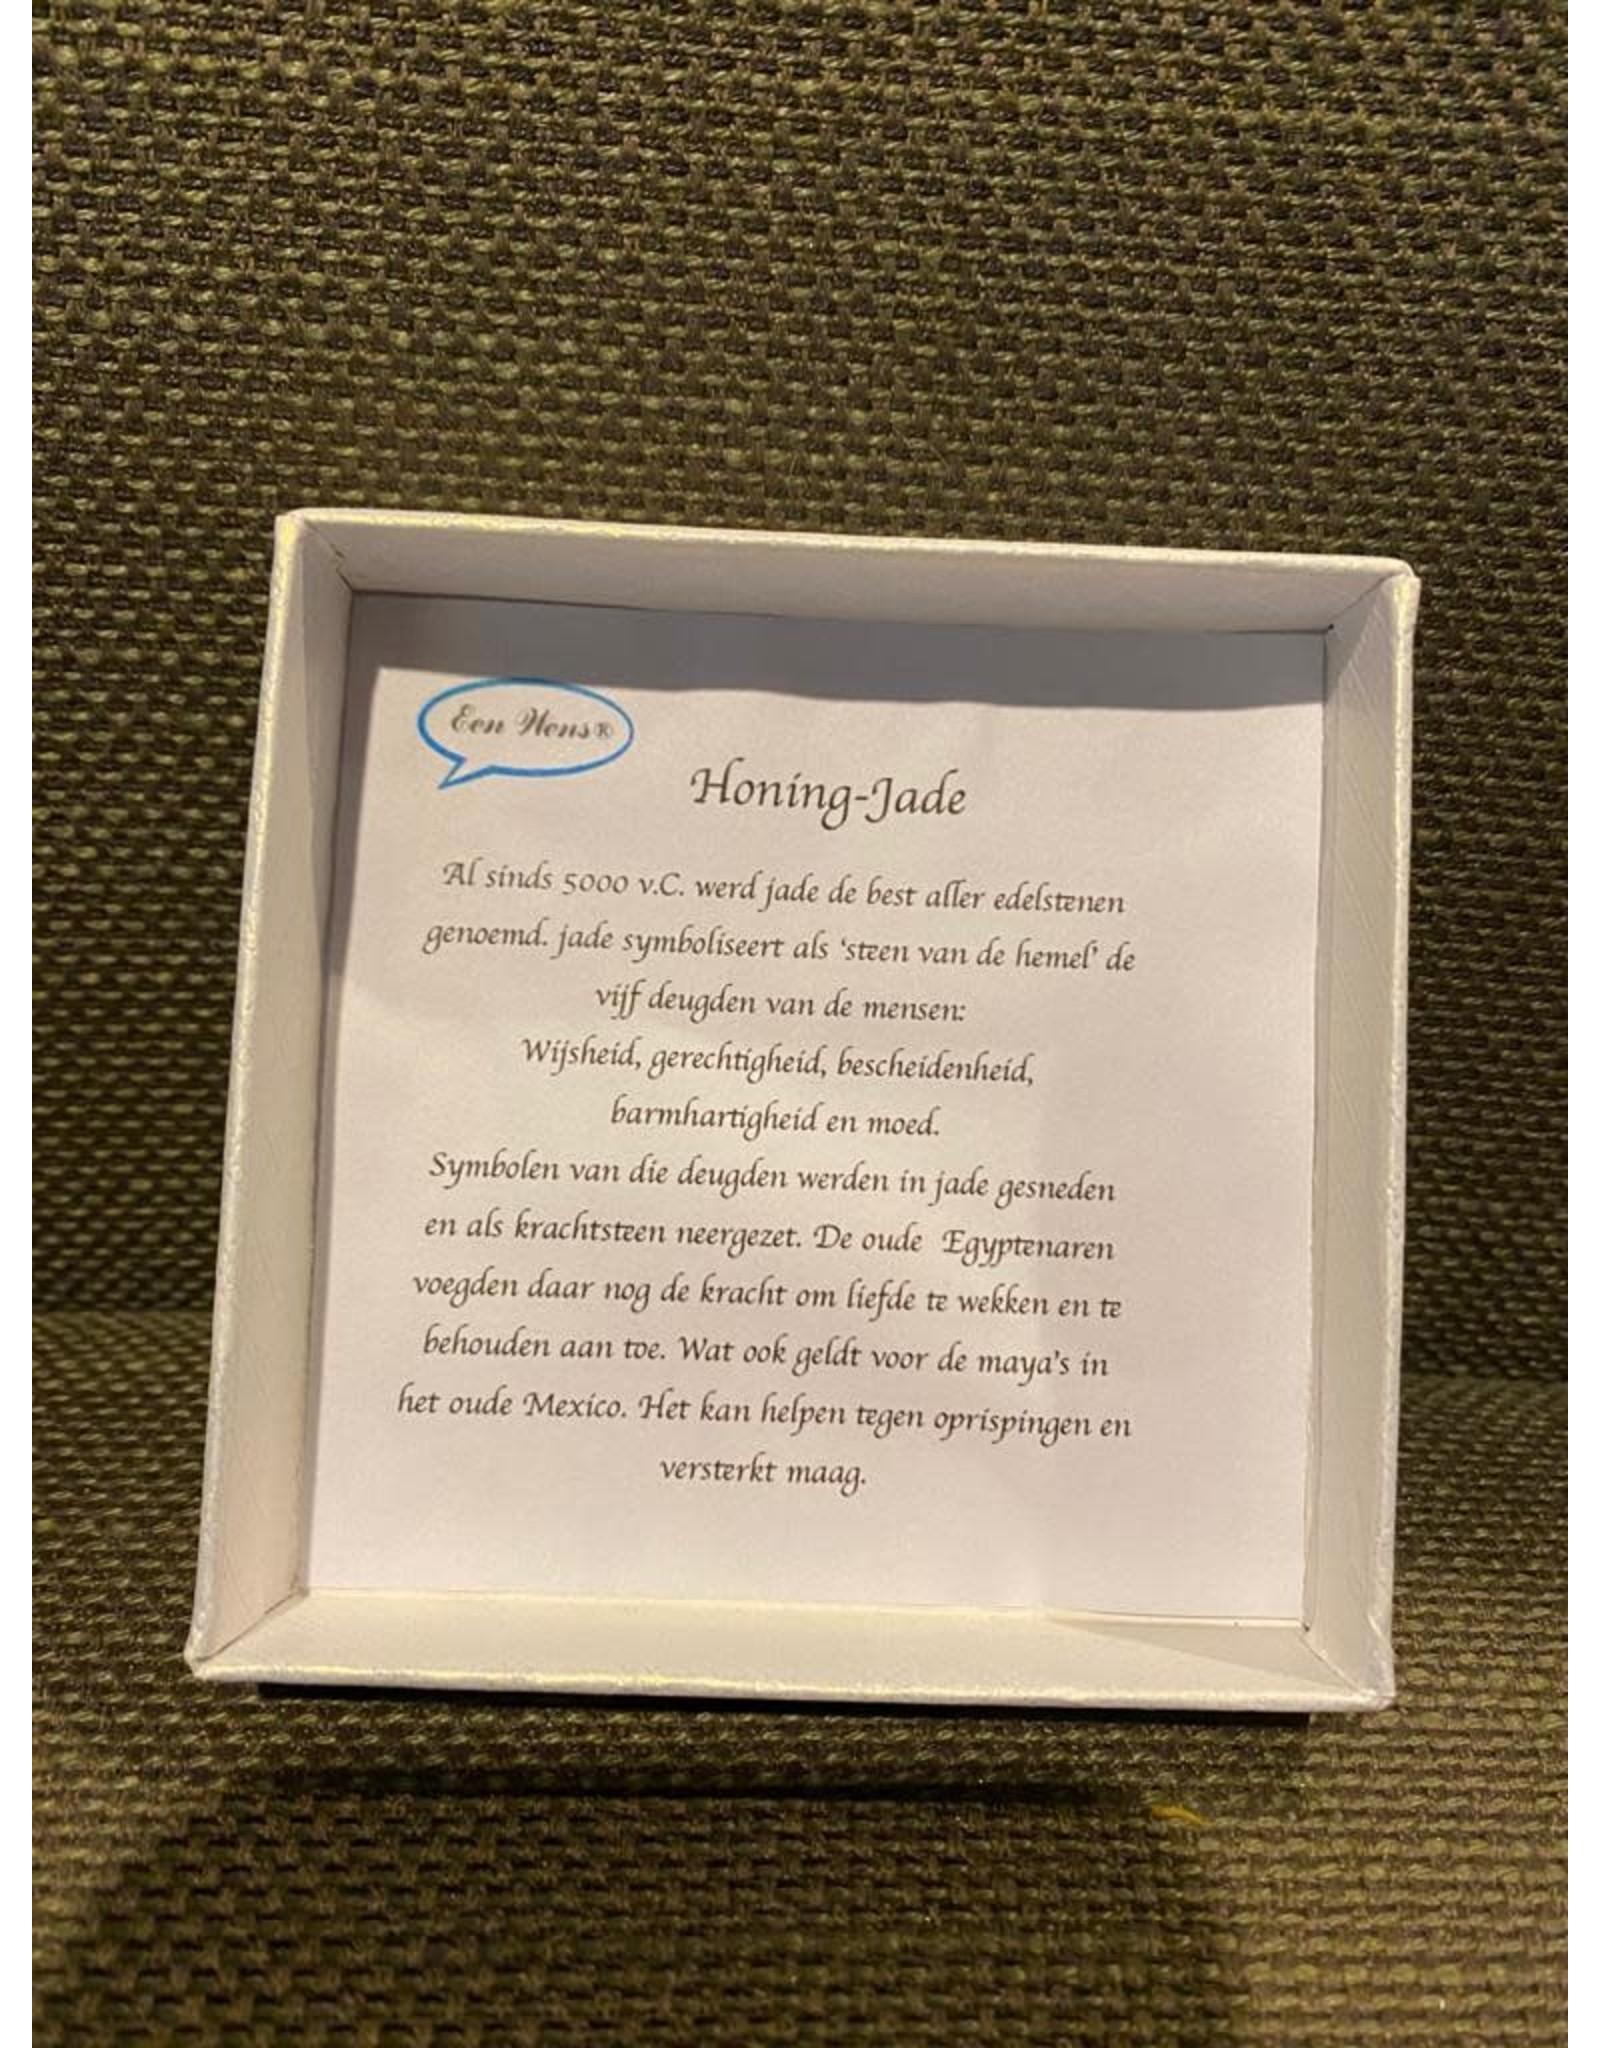 Wensarmband Honing-Jade